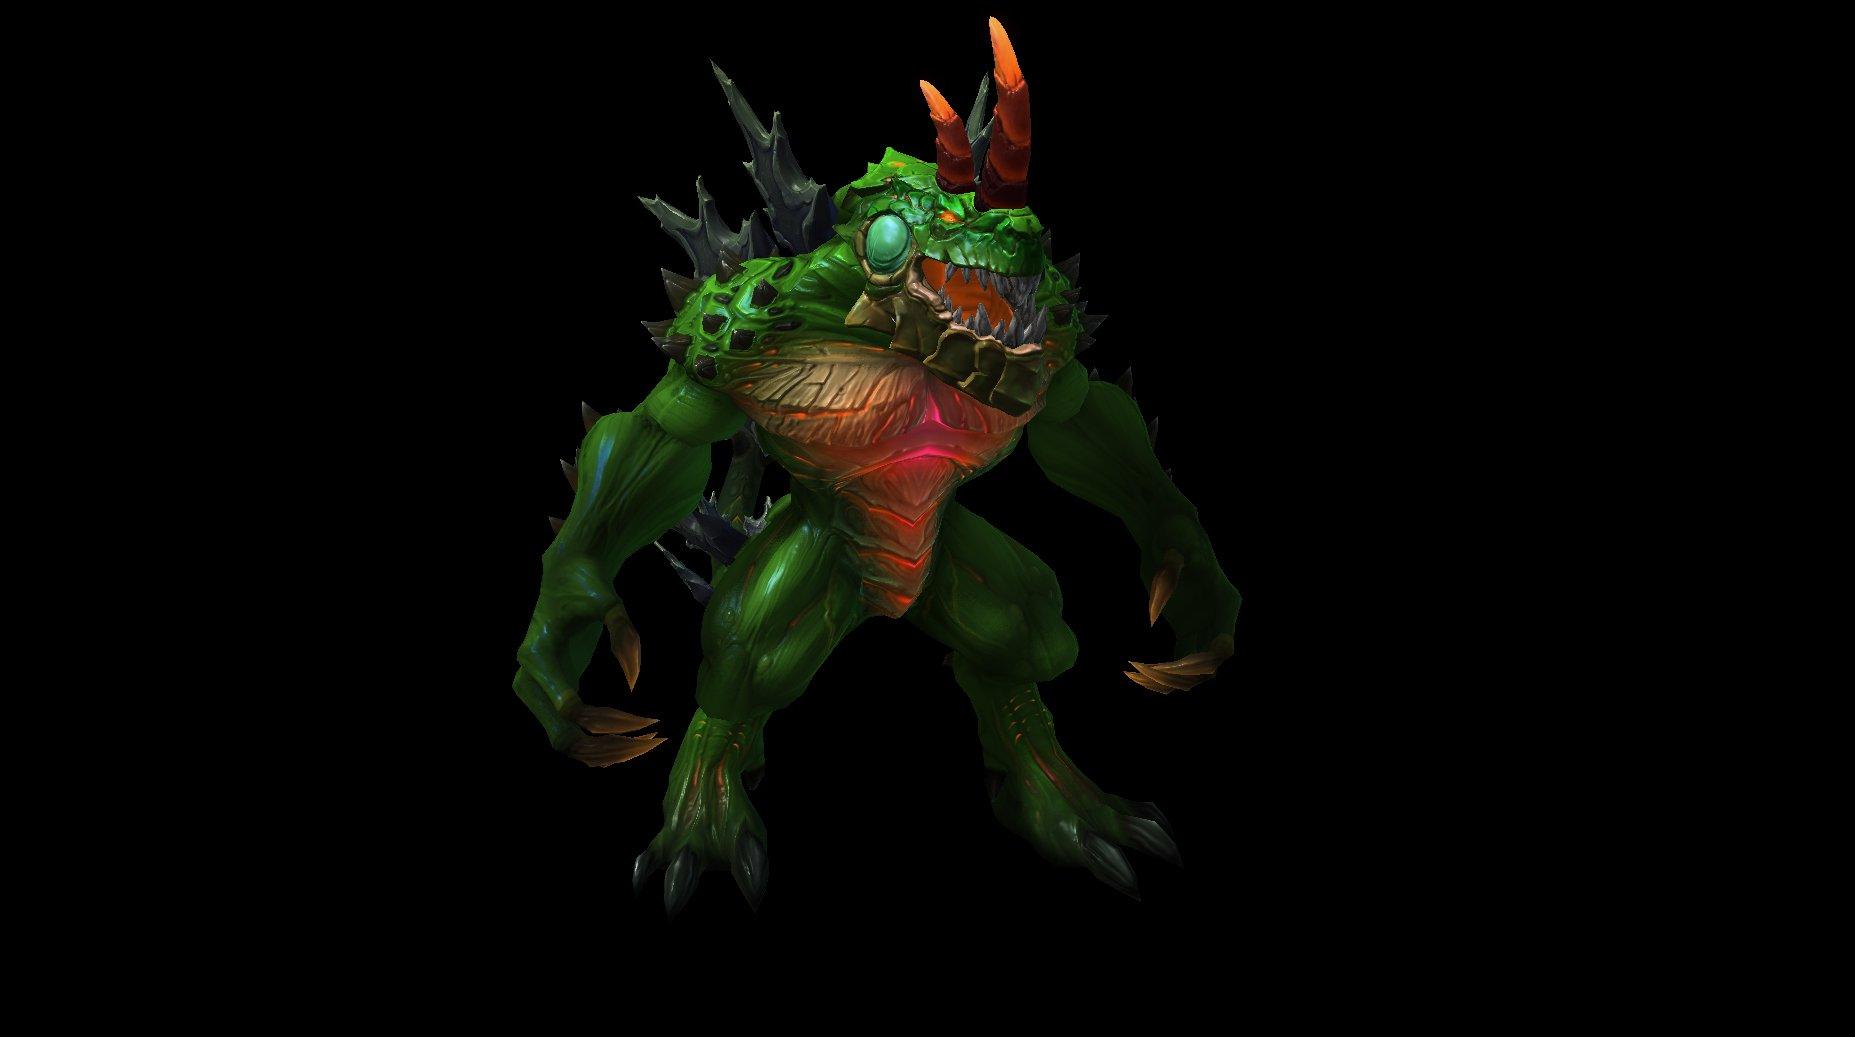 Diablo Green